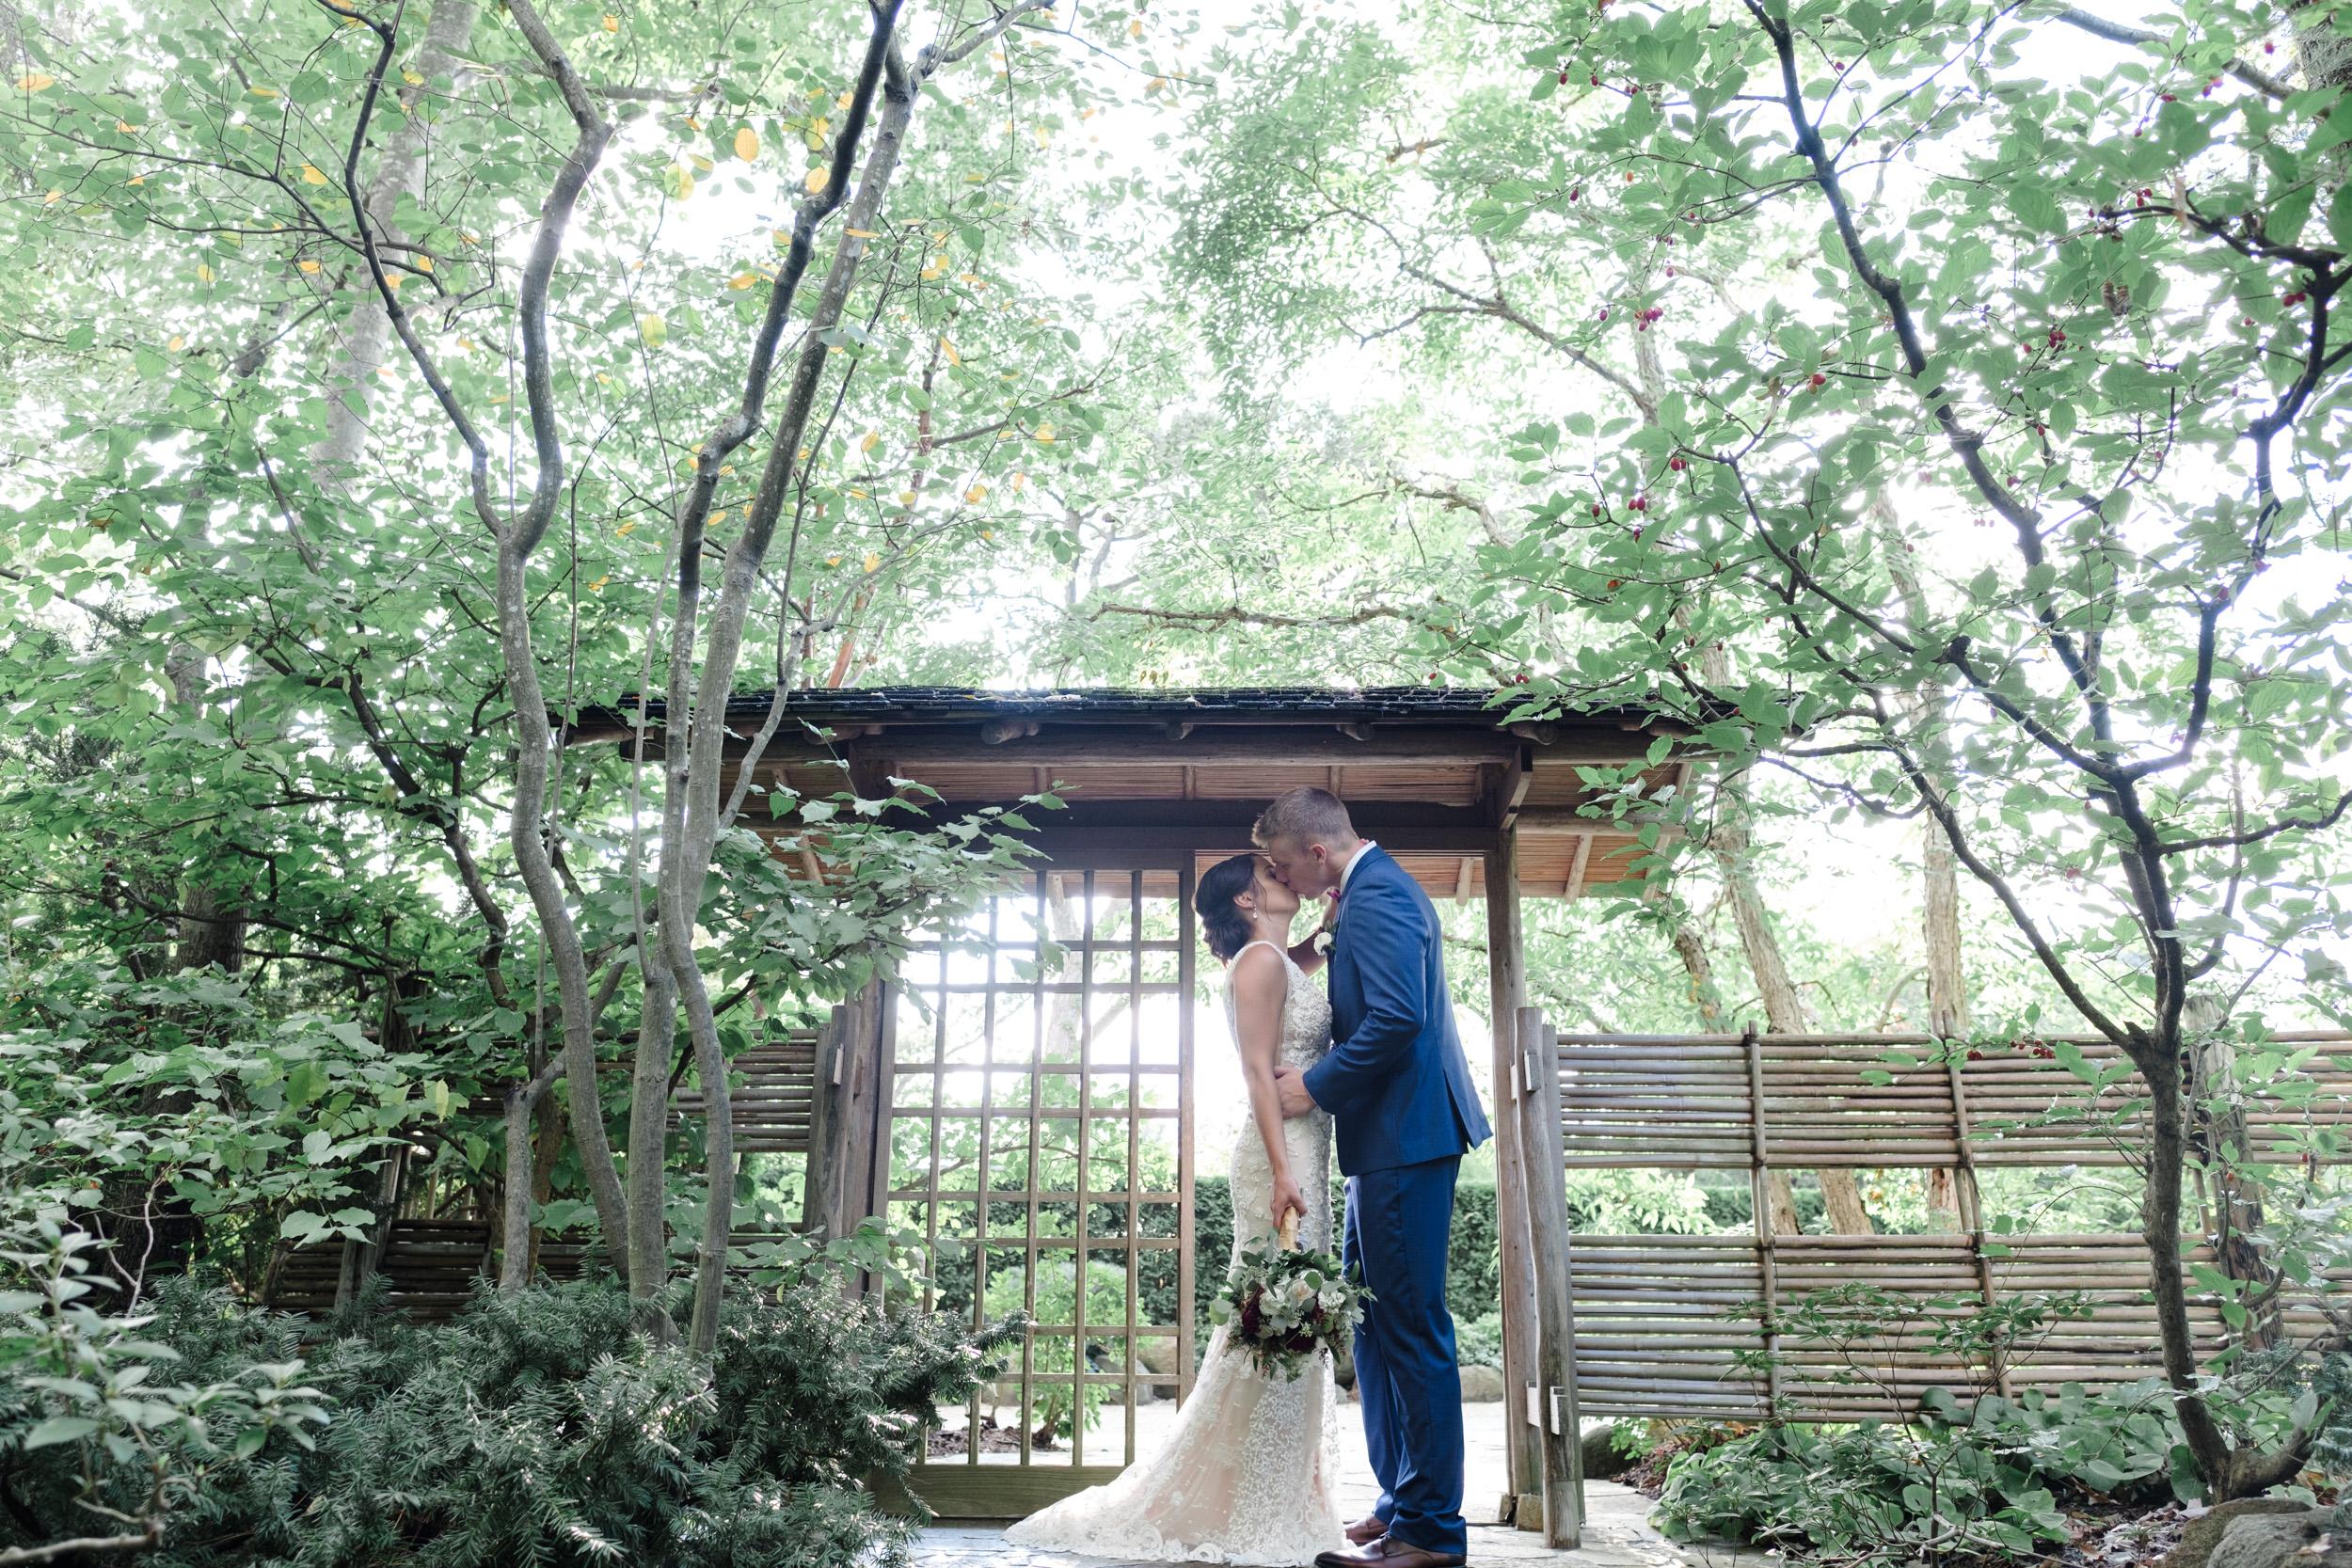 18-09-01 BAP Kiley-Trevor-Anderson-Gardens-Wedding-57.jpg